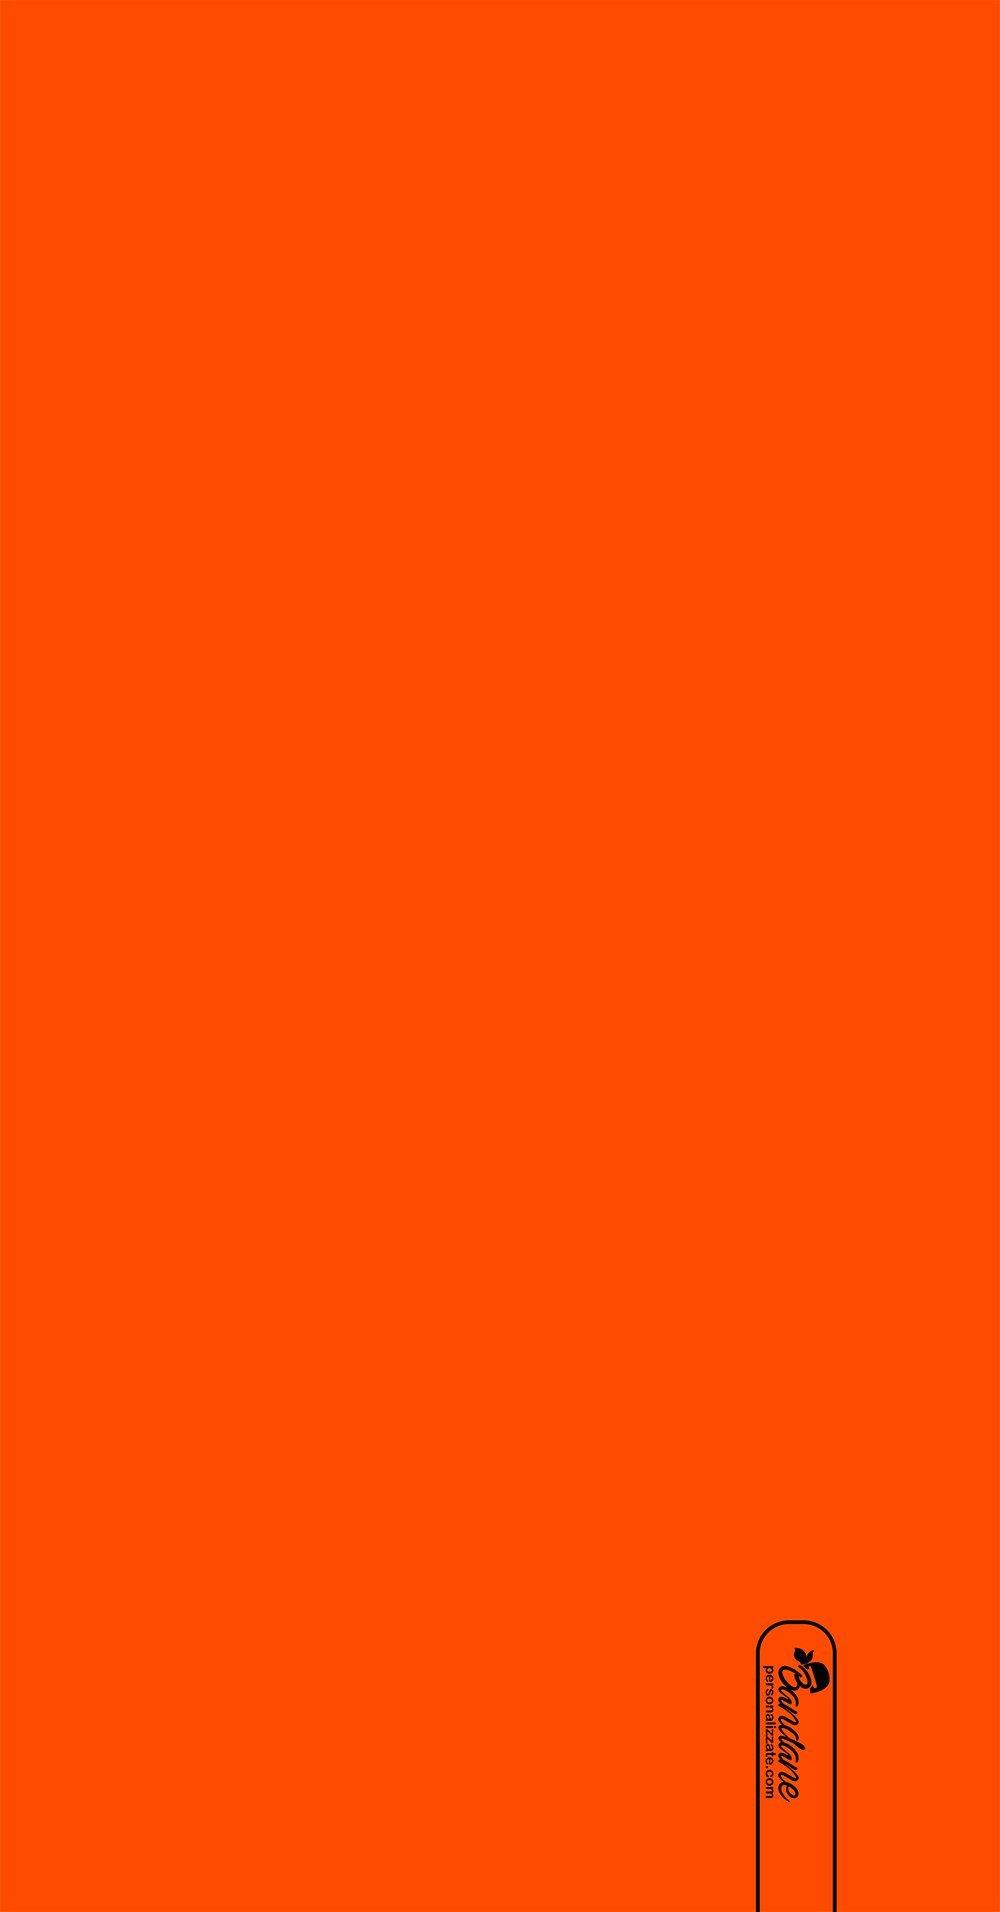 The Best And Most Comprehensive Sfondo Arancione Fluo Tinta Unita